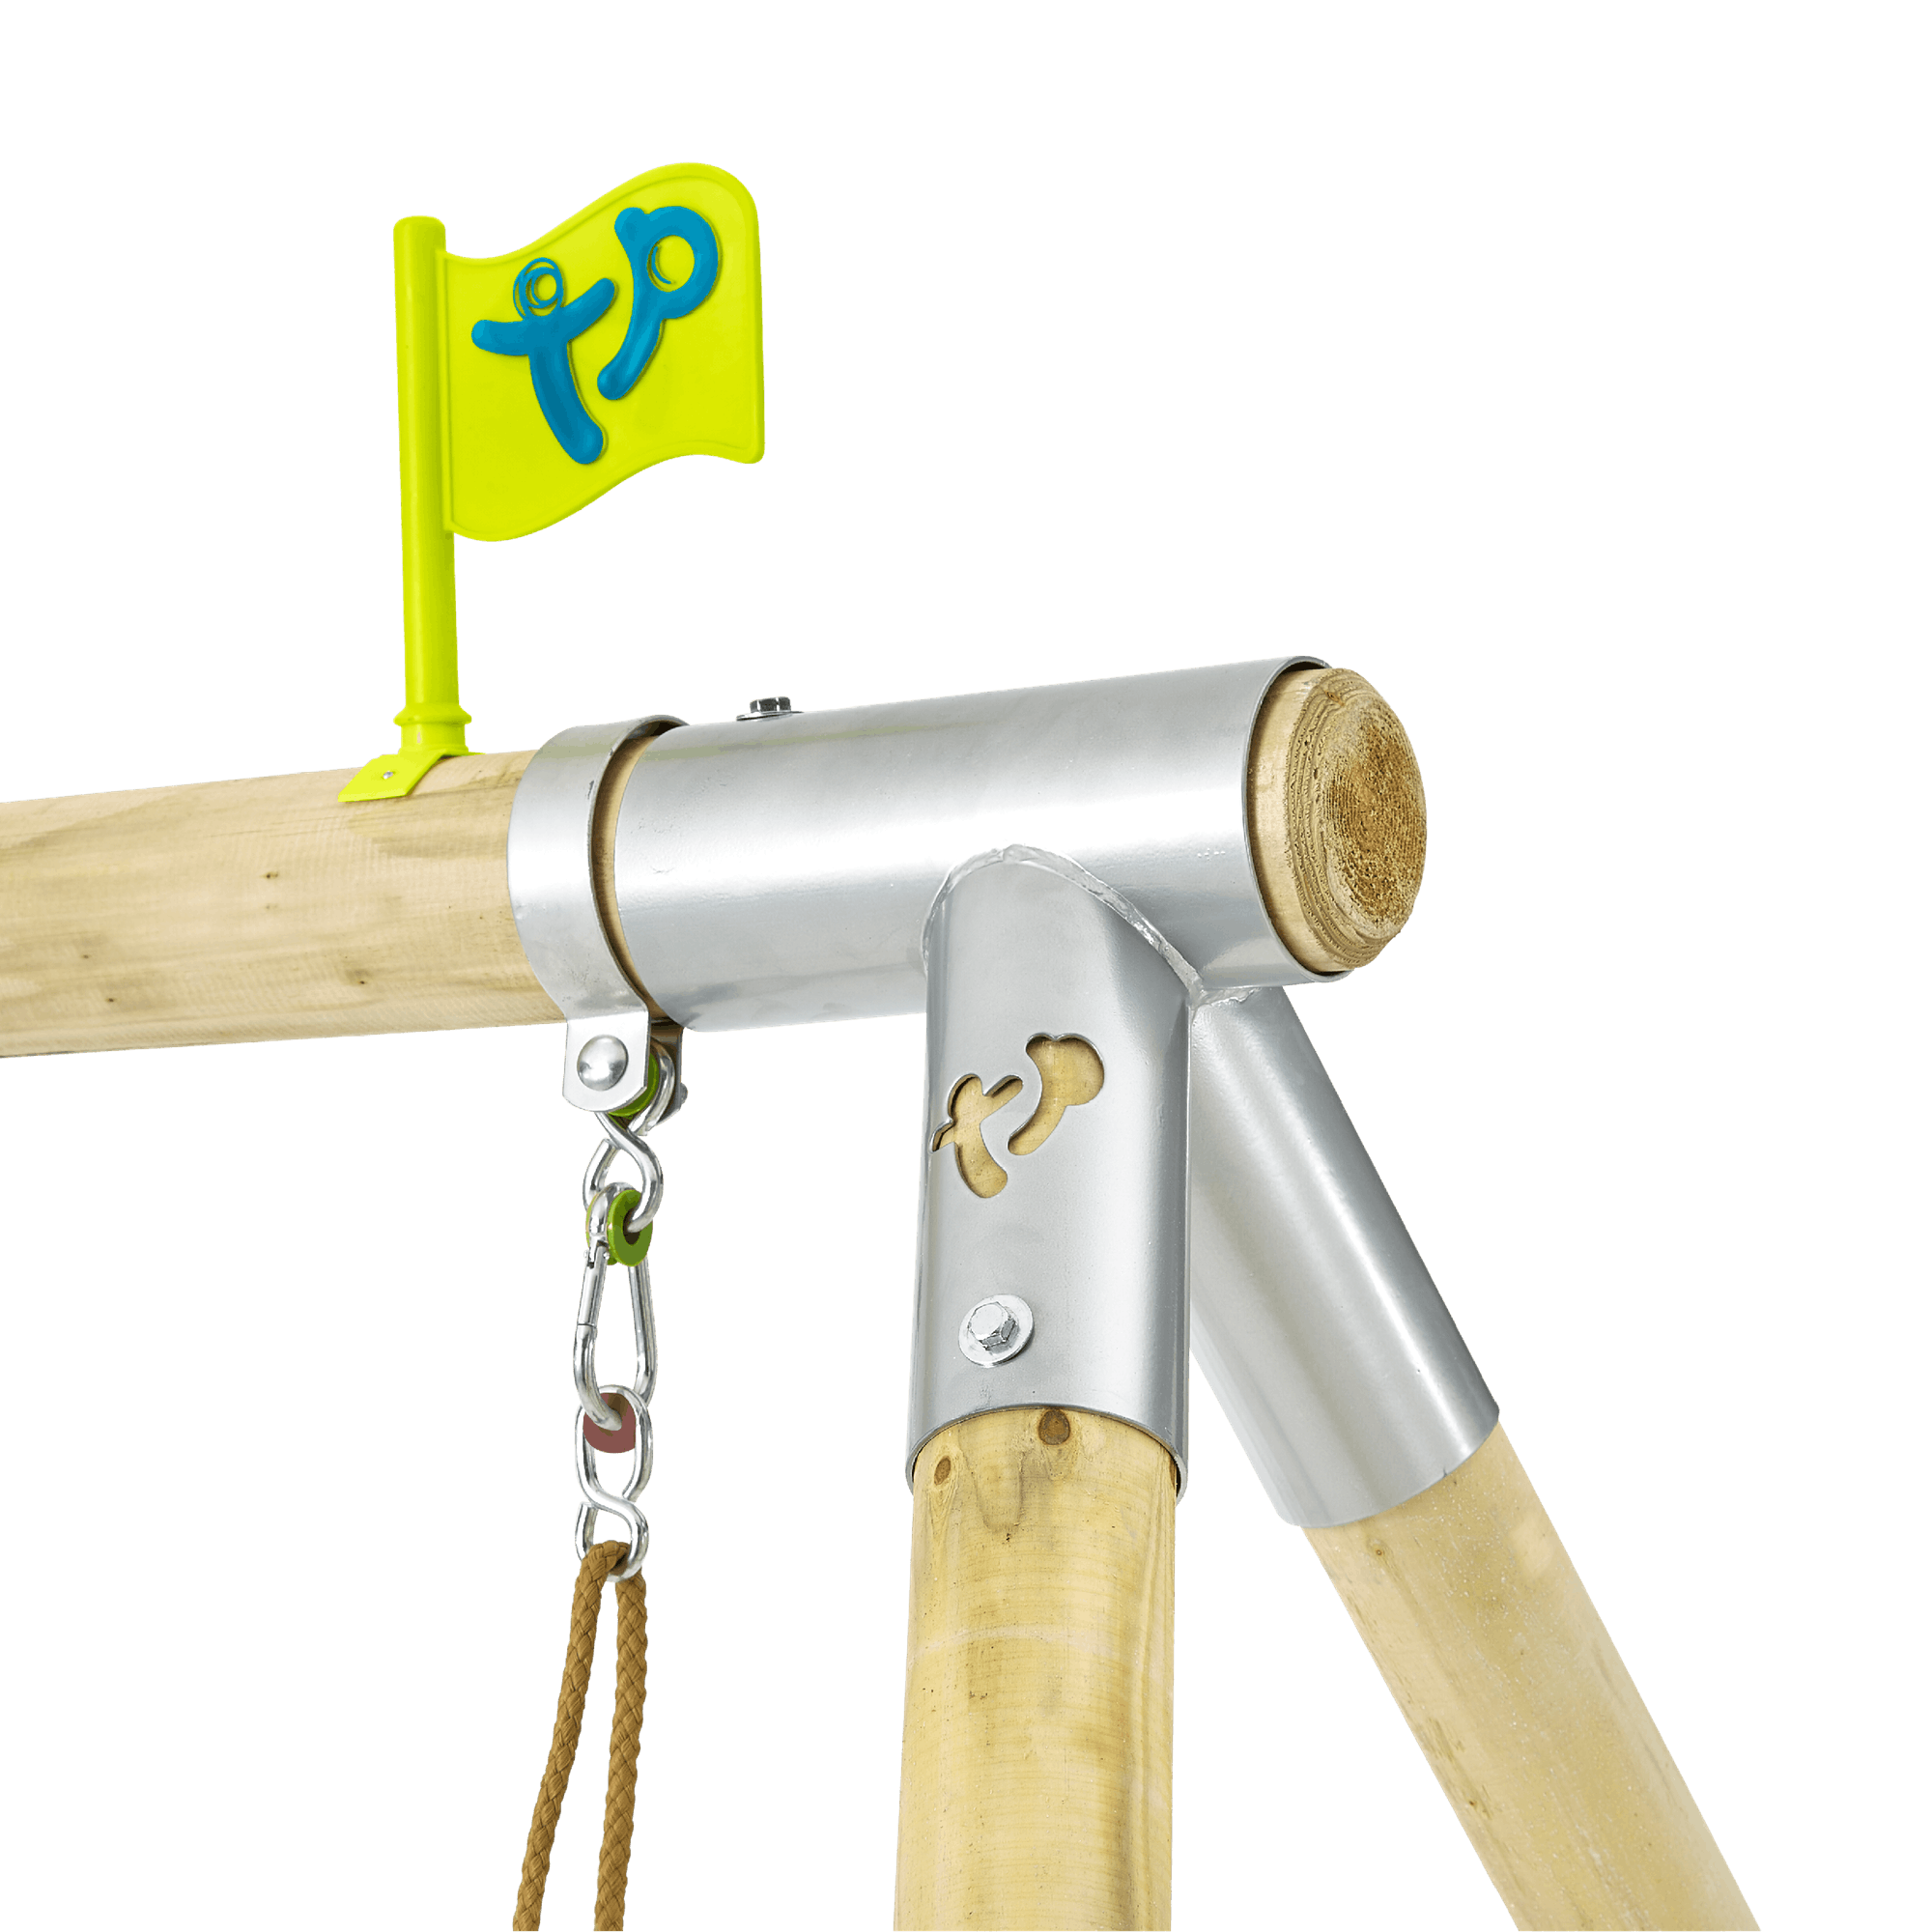 Tp Knightswood Tours Wooden Swing Set-fsc?